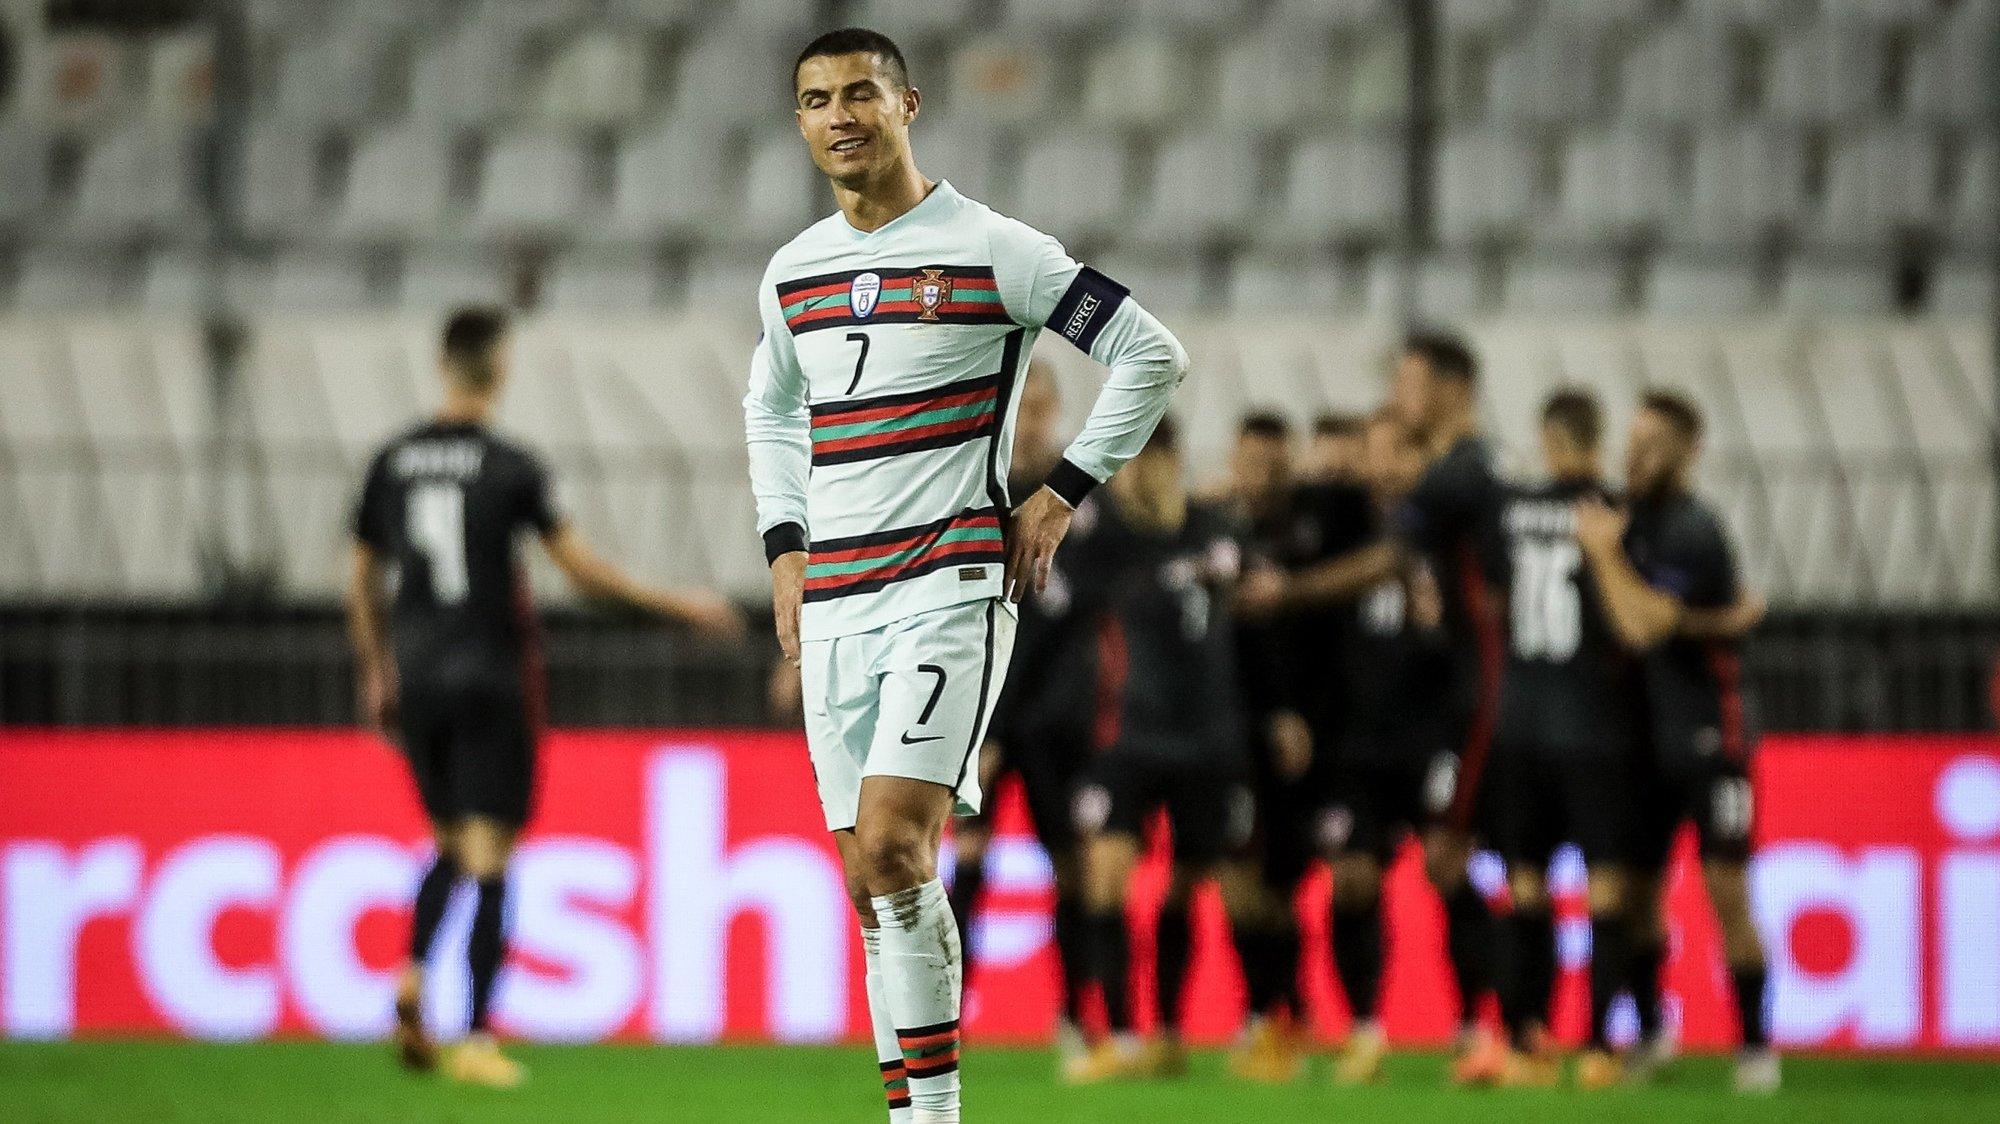 epa08826316 Portugal's Cristiano Ronaldo reacts after the 2nd goal of Croatia during their UEFA Nations League group 3 soccer match Croatia vs Portugal held at Poljud Stadium, Split, Croatia, 17 November 2020.  EPA/PAULO NOVAIS